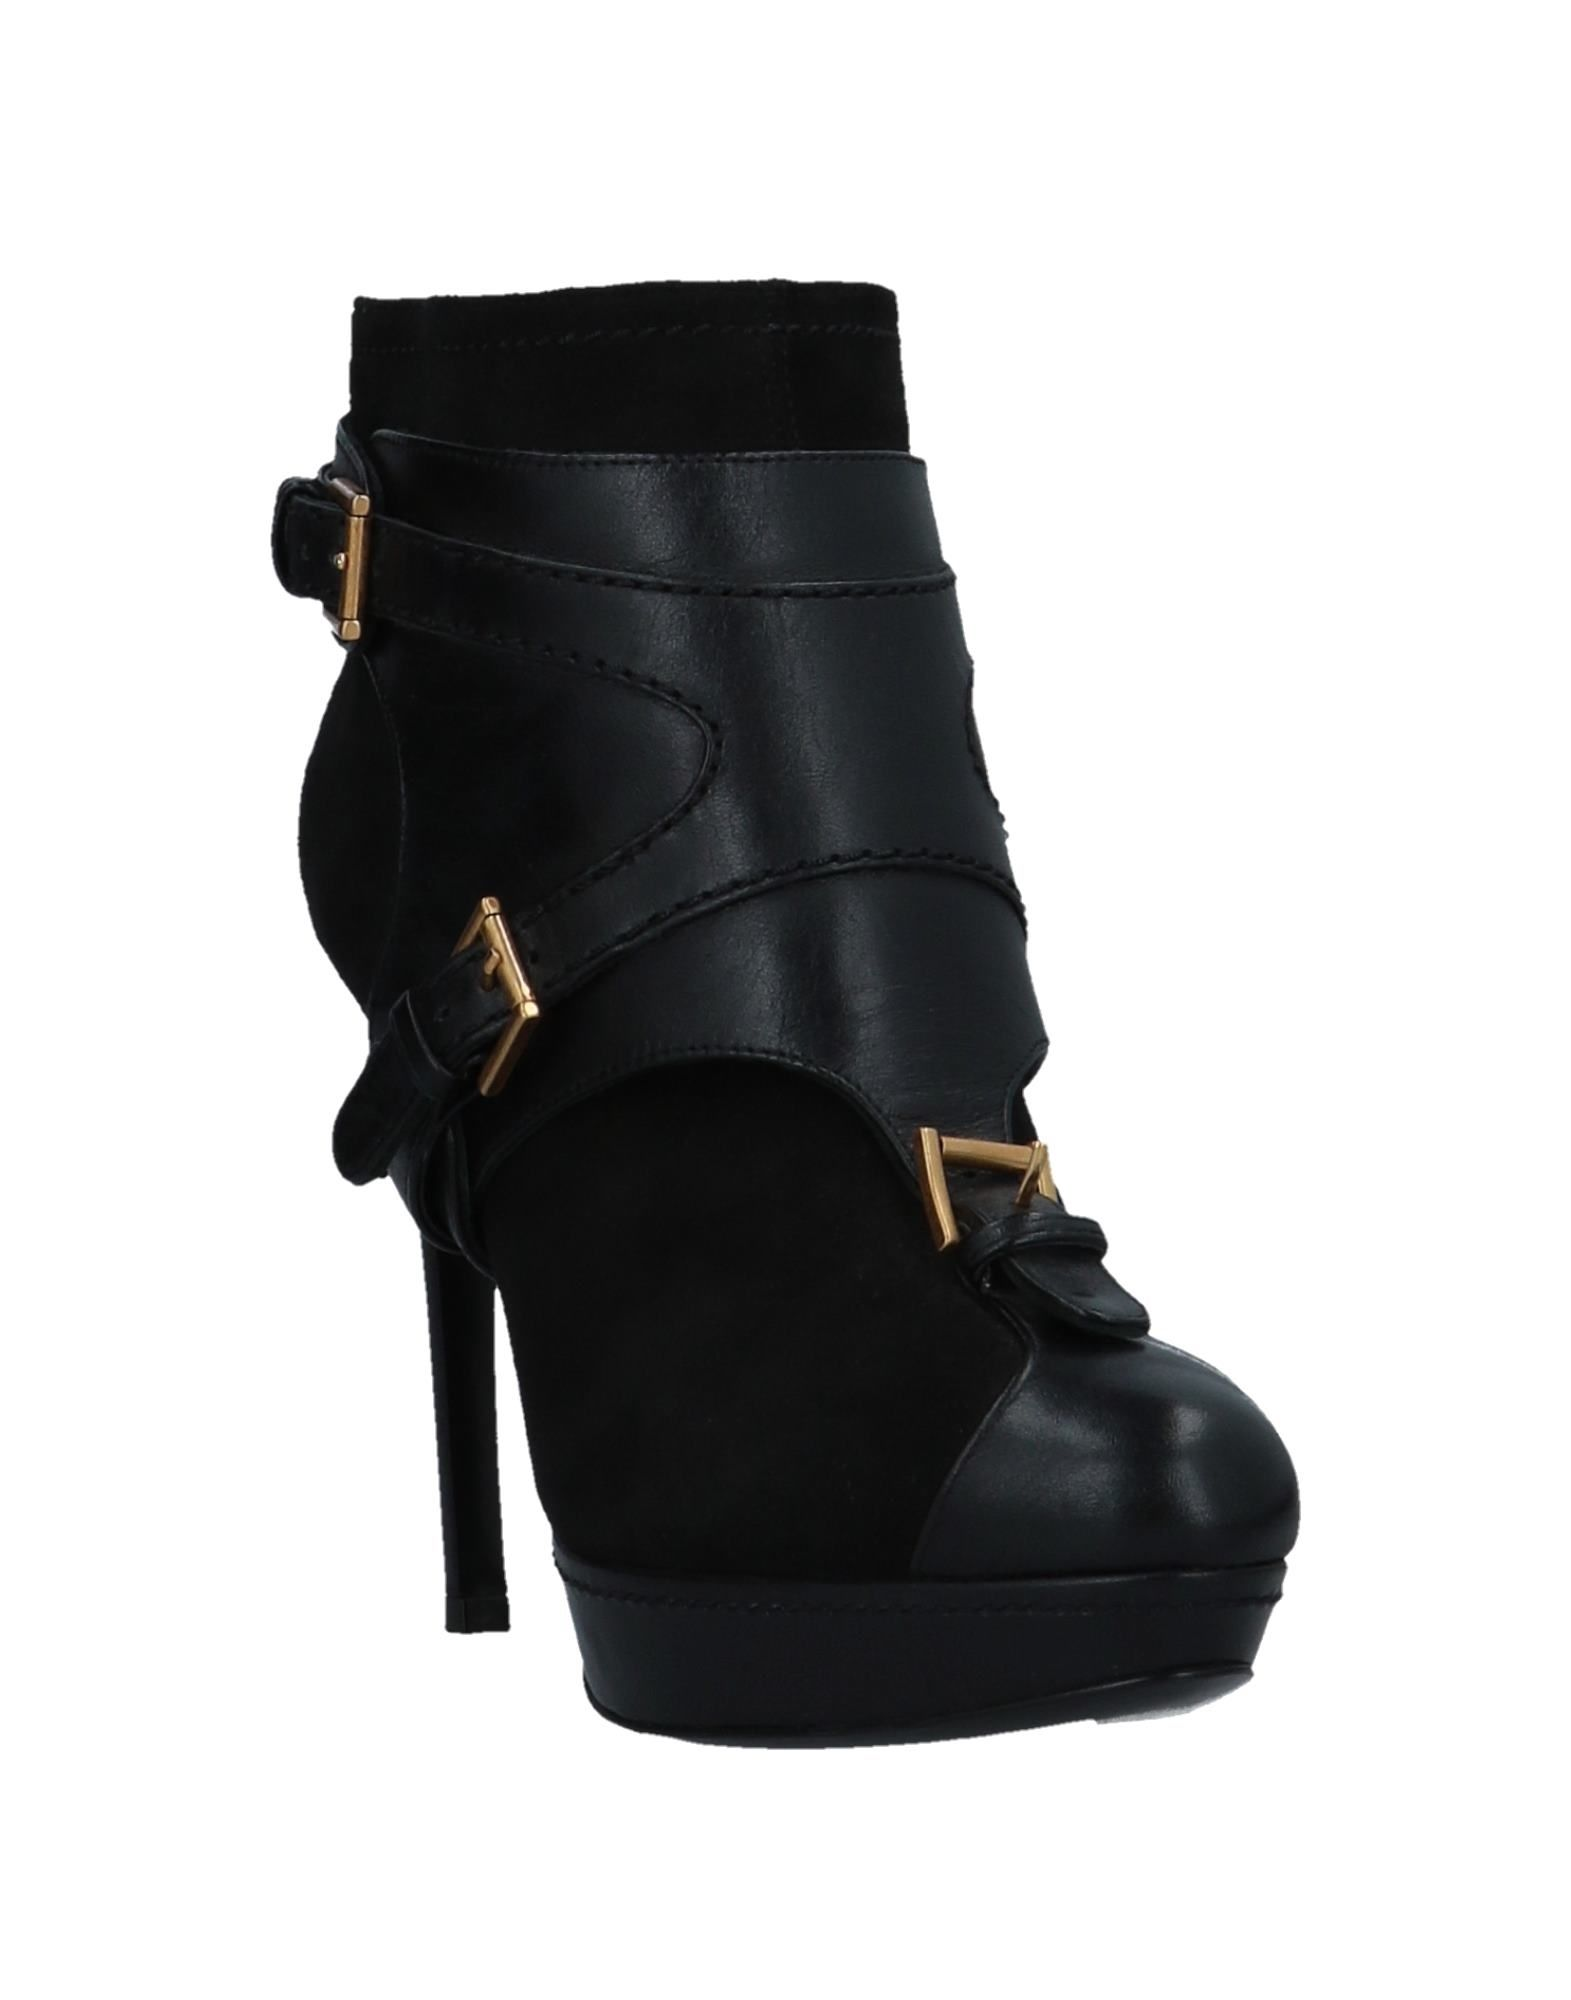 Alexander Mcqueen Stiefelette Damen Schuhe  11522323EEGünstige gut aussehende Schuhe Damen a94265